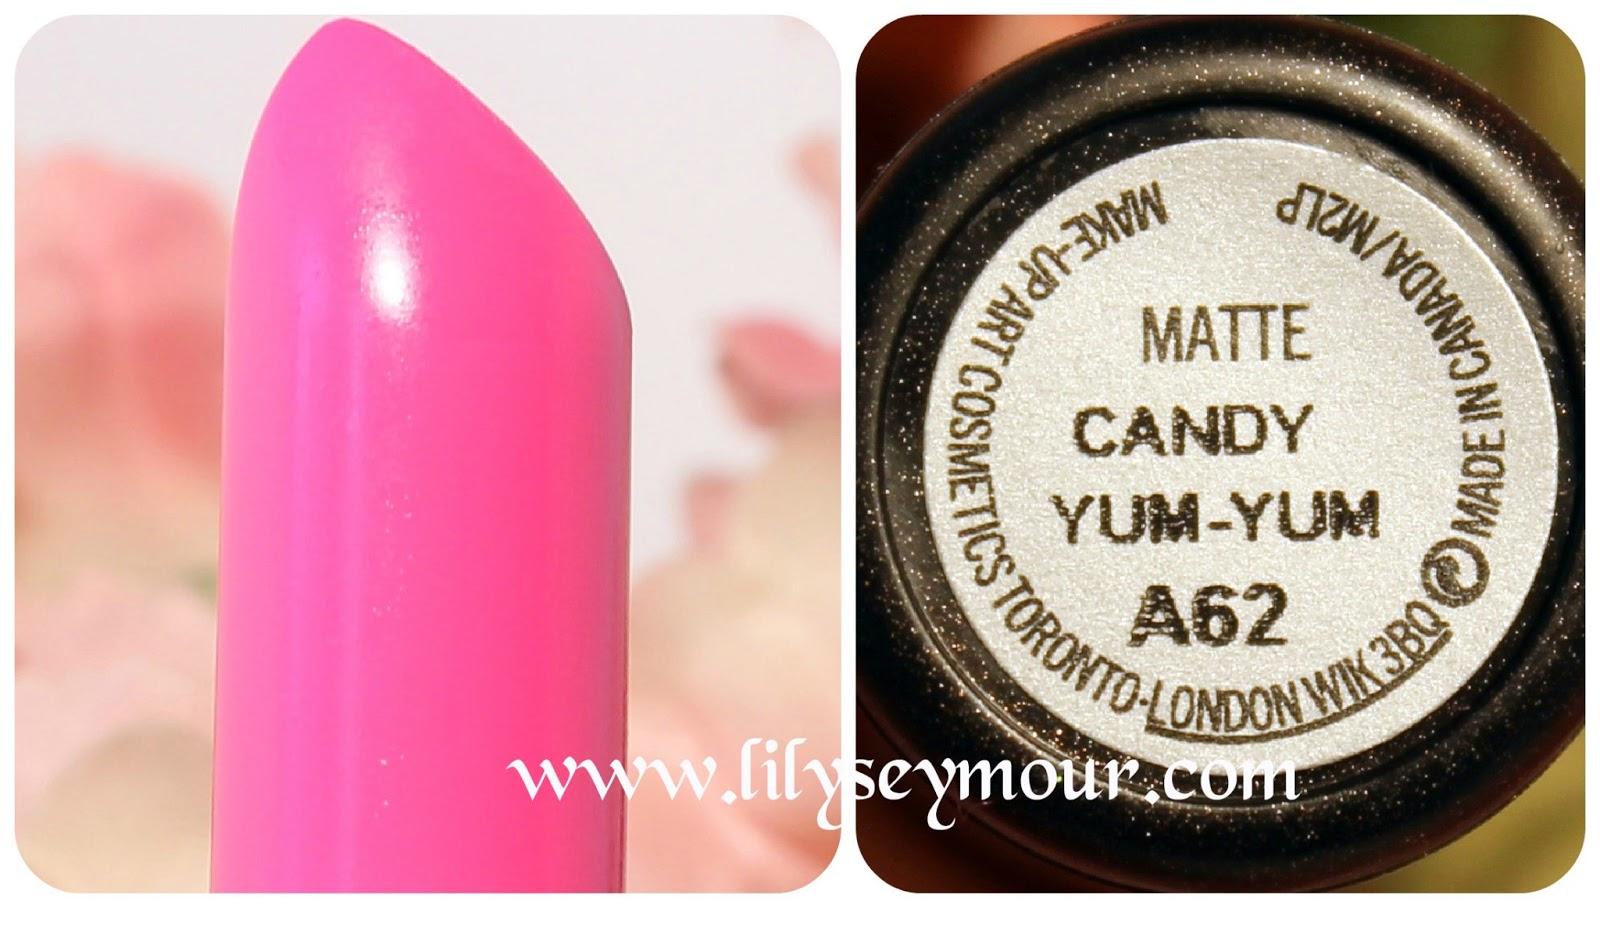 http://3.bp.blogspot.com/-bhaRUSmeCLA/UPthZqBm_uI/AAAAAAAAIV4/oarfCcoZu6s/s1600/Candy+Yum+Yum-2.jpg